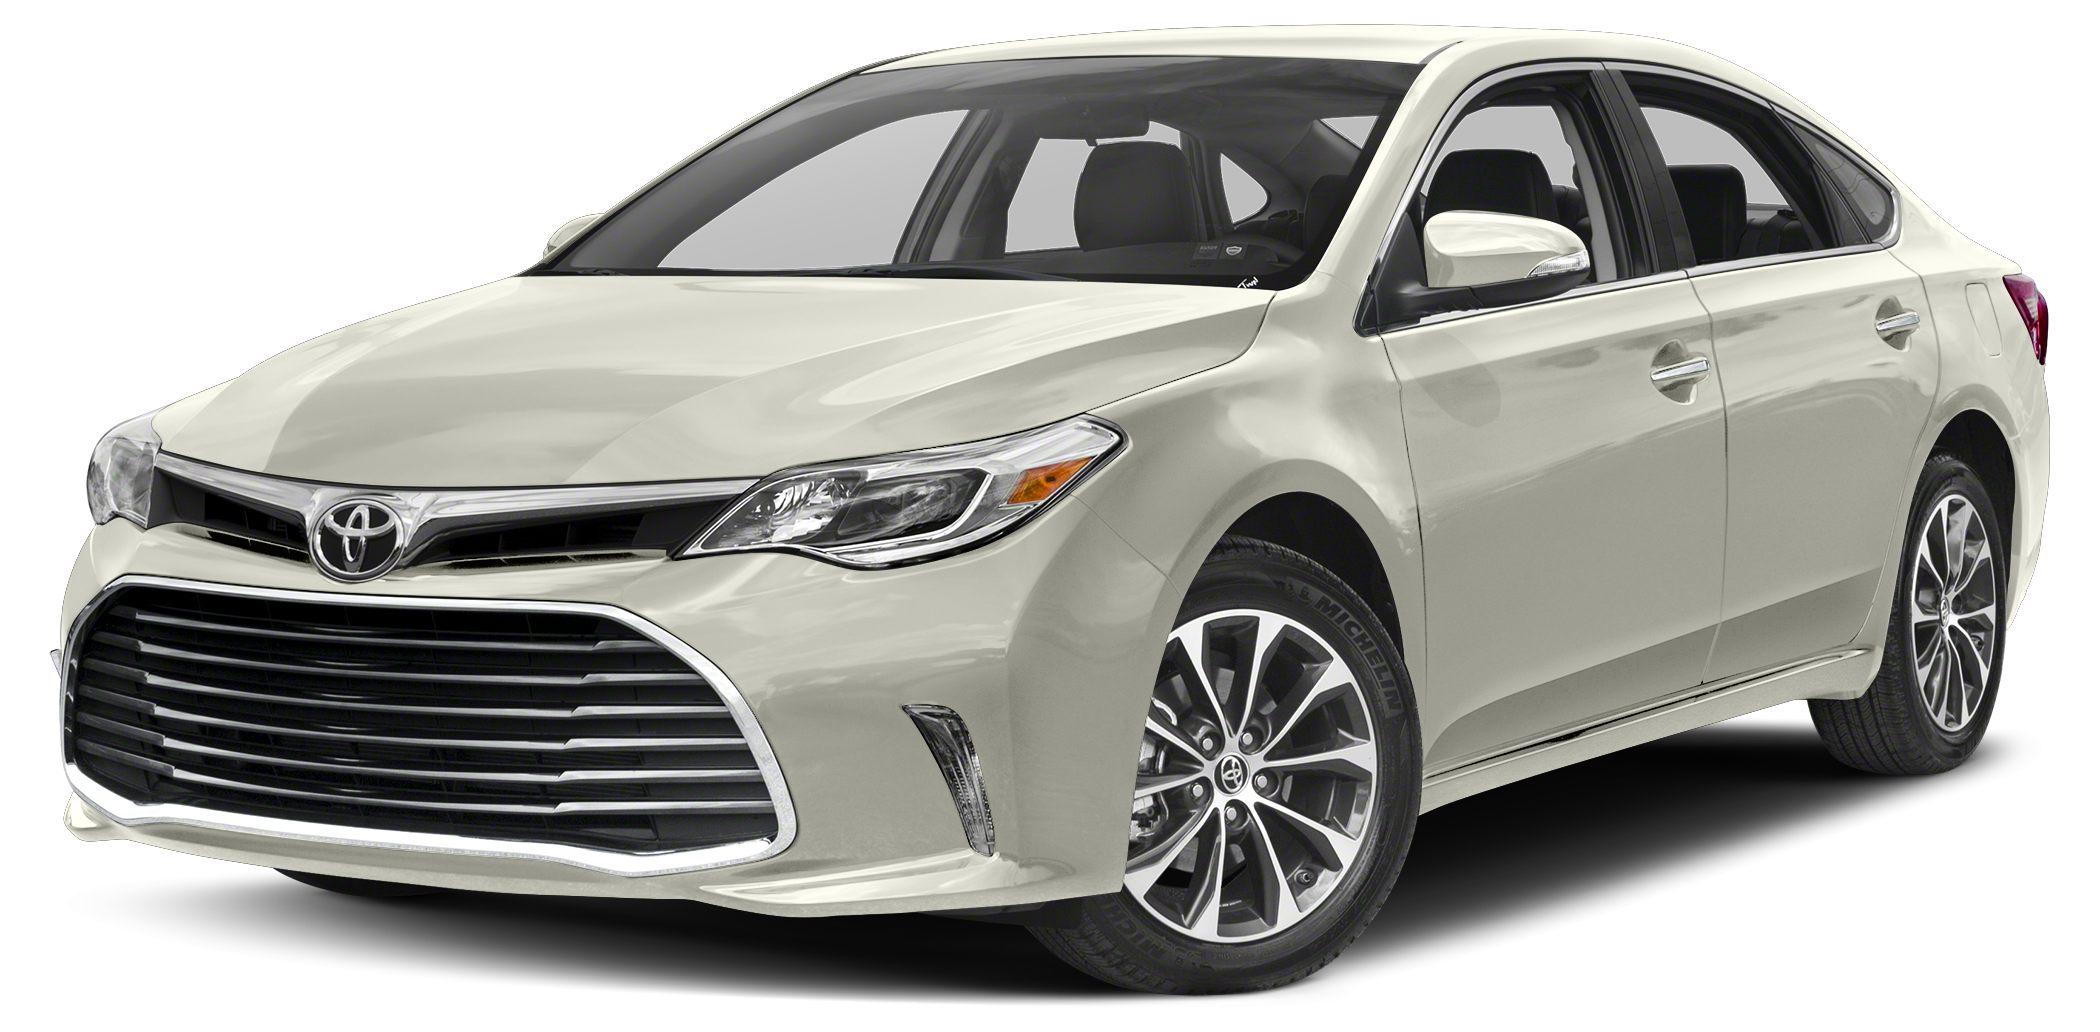 2018 Toyota Avalon XLE Miles 0Color Blizzard Pearl Stock 6282432 VIN 4T1BK1EBXJU282432